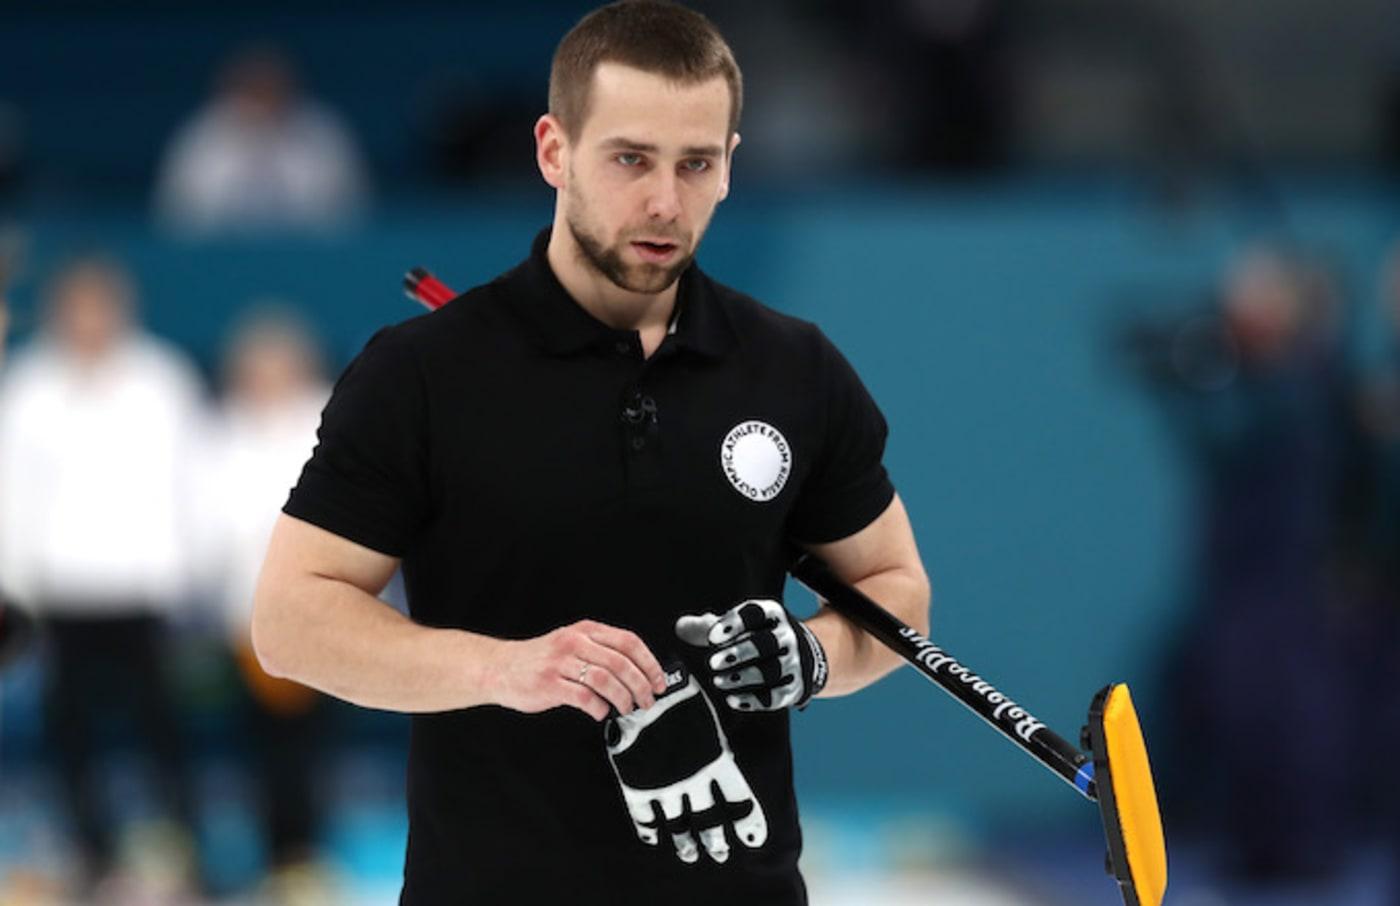 Aleksandr Krushelnitckii